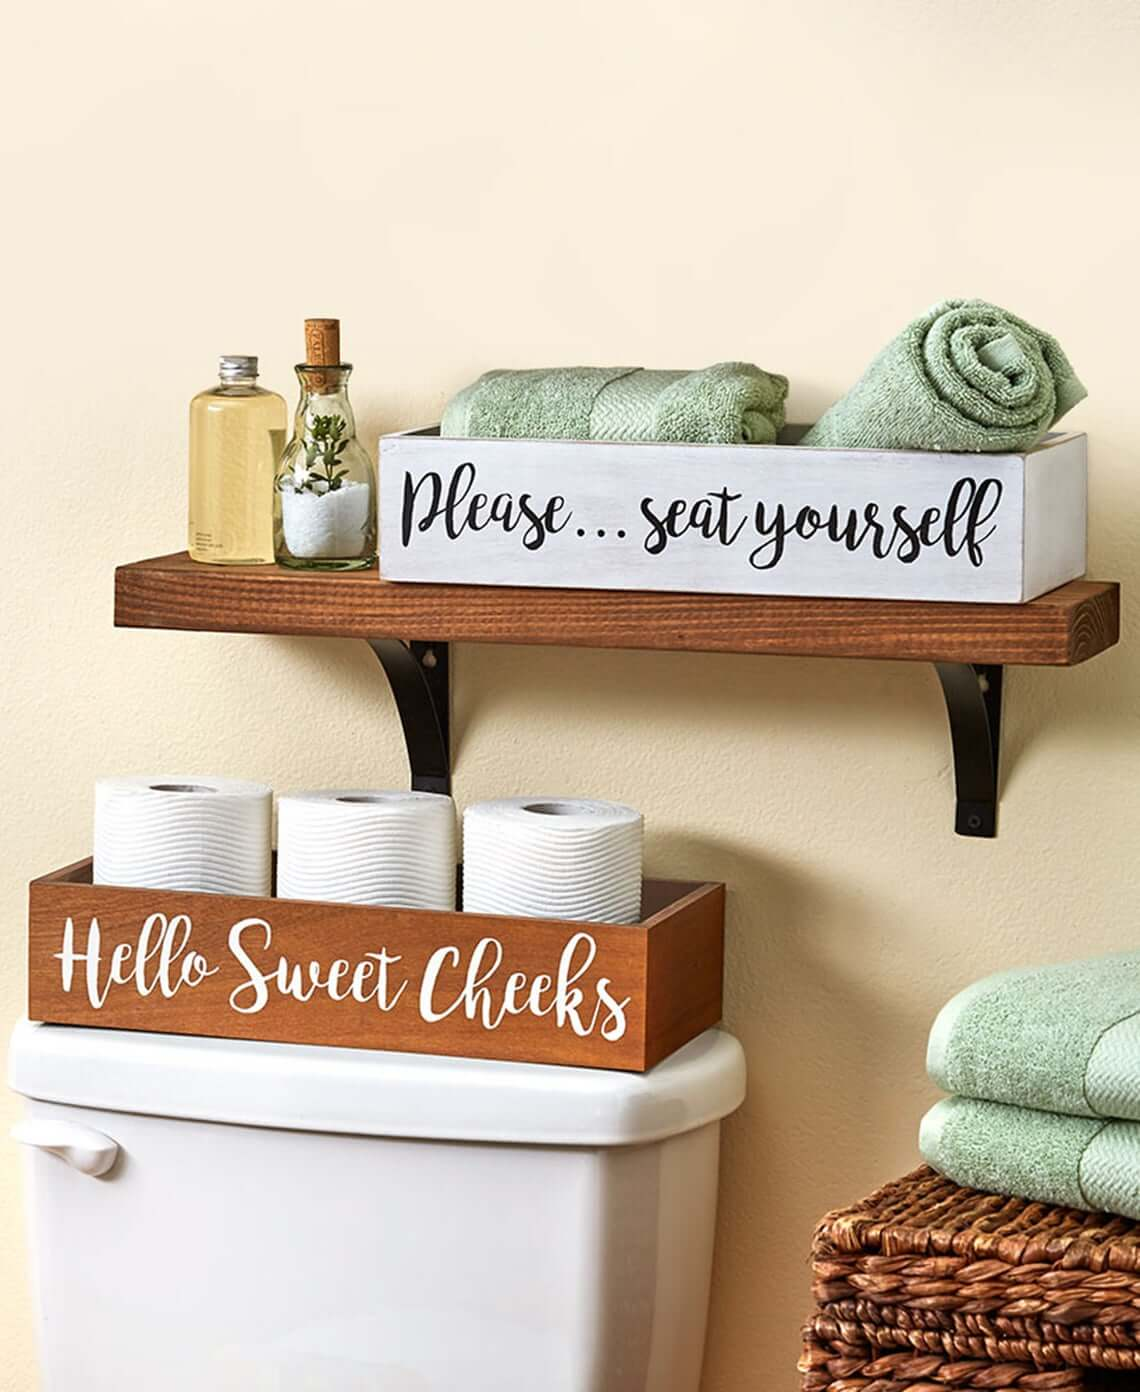 Cheeky Bathroom Humor Organizer Boxes